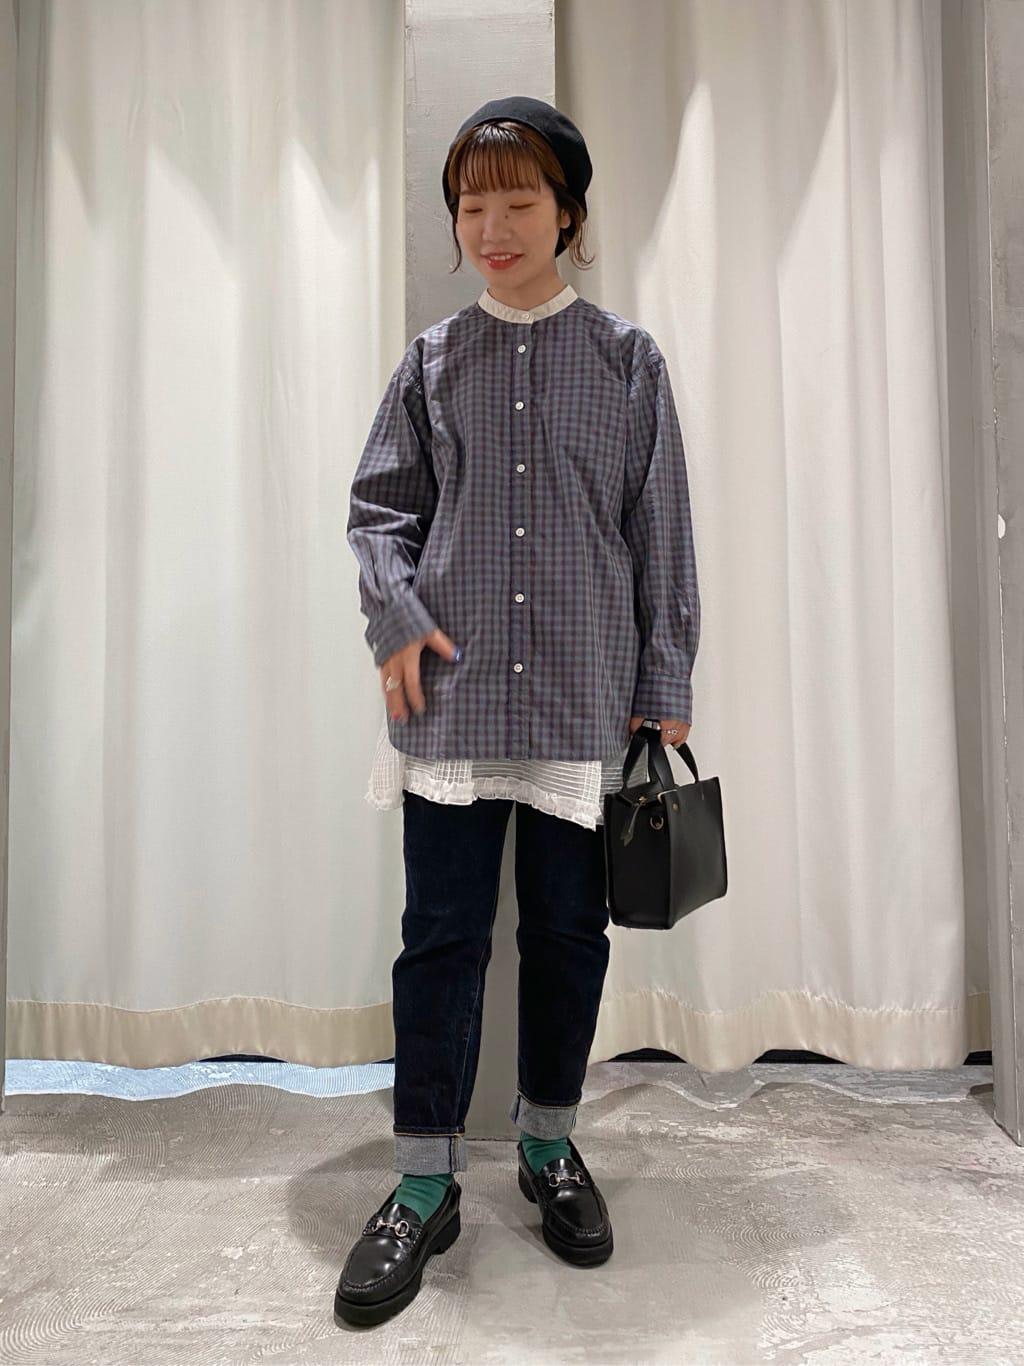 - CHILD WOMAN CHILD WOMAN , PAR ICI ルミネ横浜 身長:153cm 2021.09.10